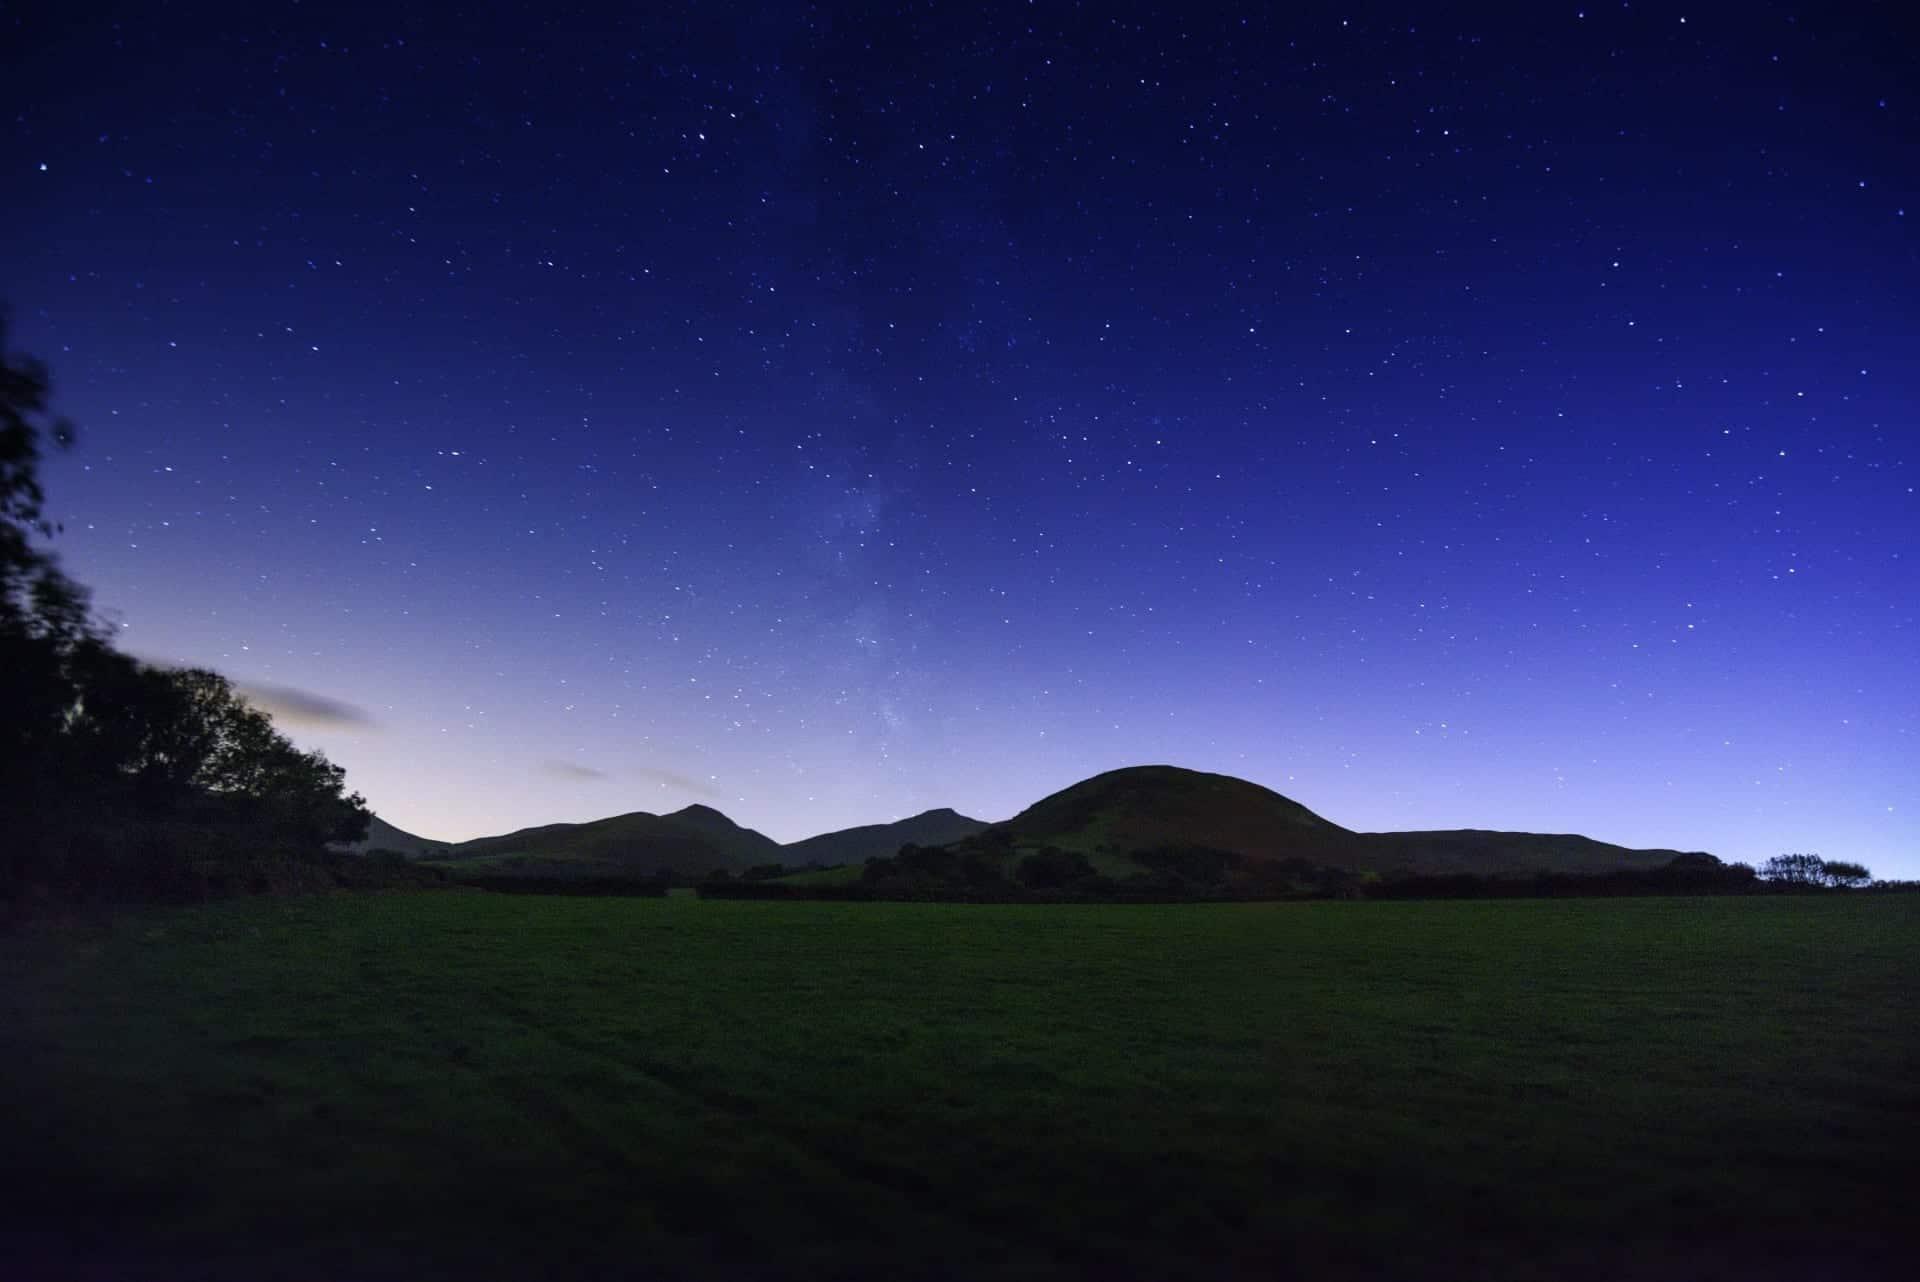 night sky image at night while glamping